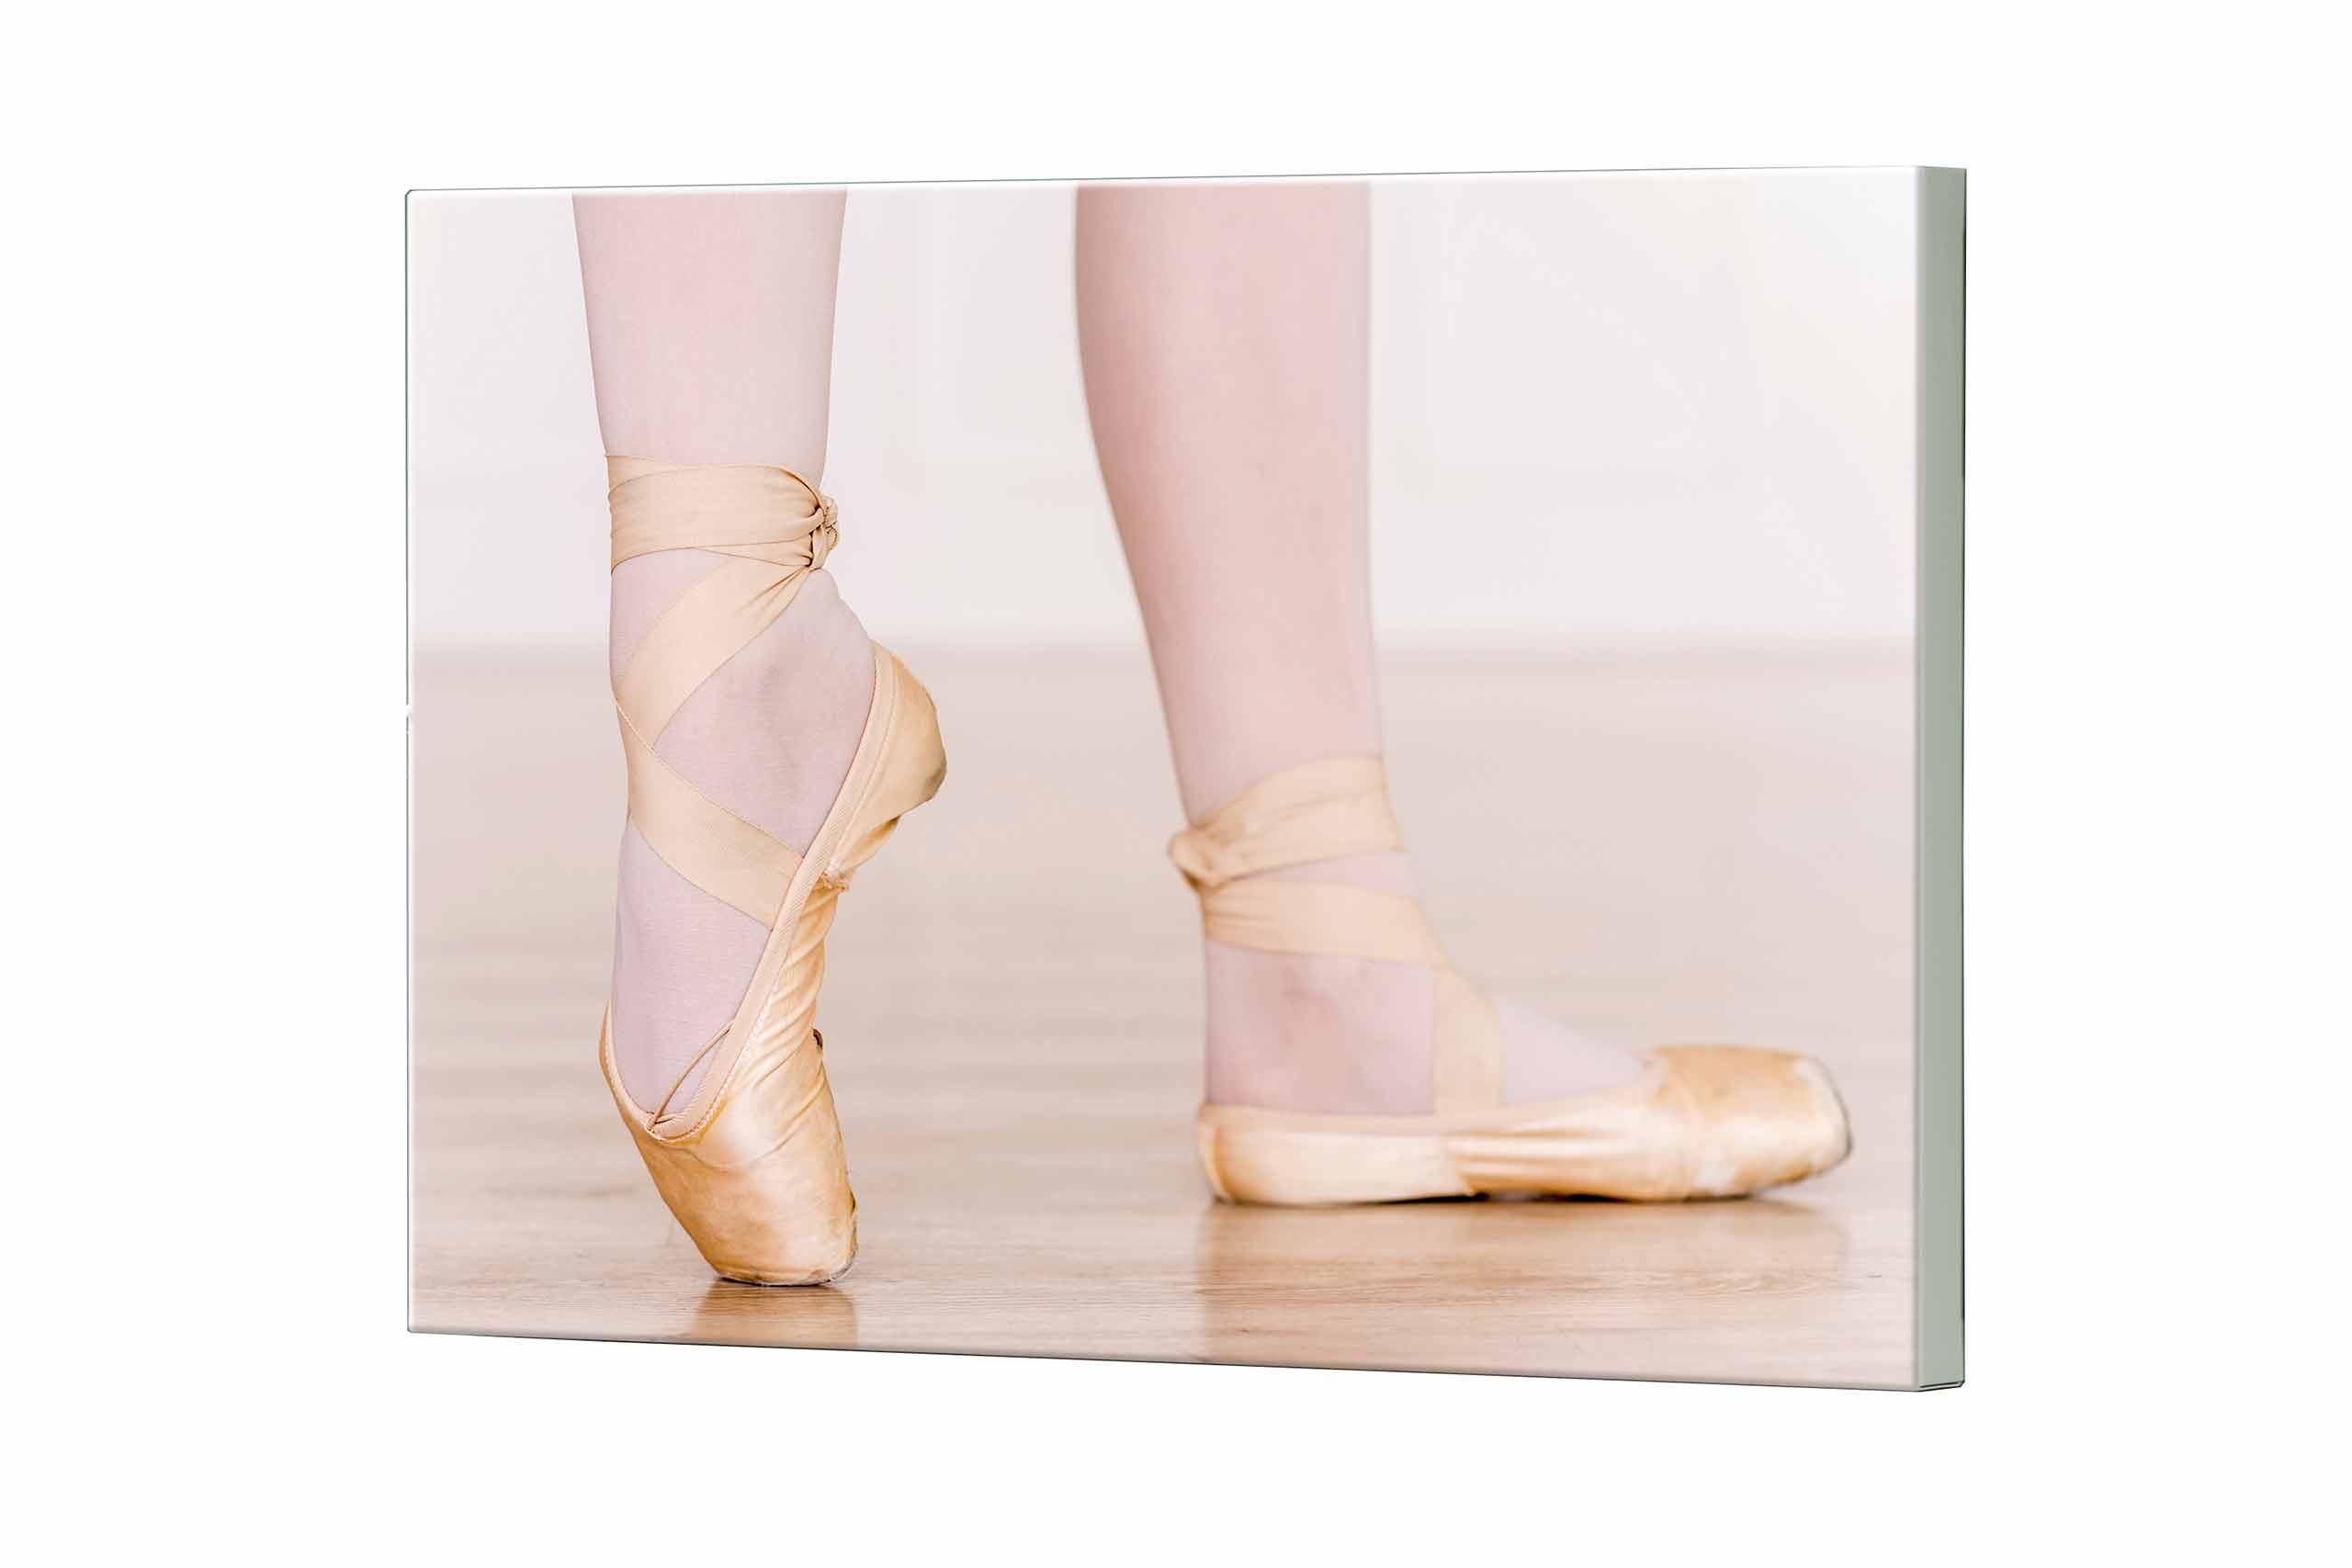 Magnettafel NOTIZ 80x60cm Motiv Ballerina MDQ330 Motiv-Pinnwand